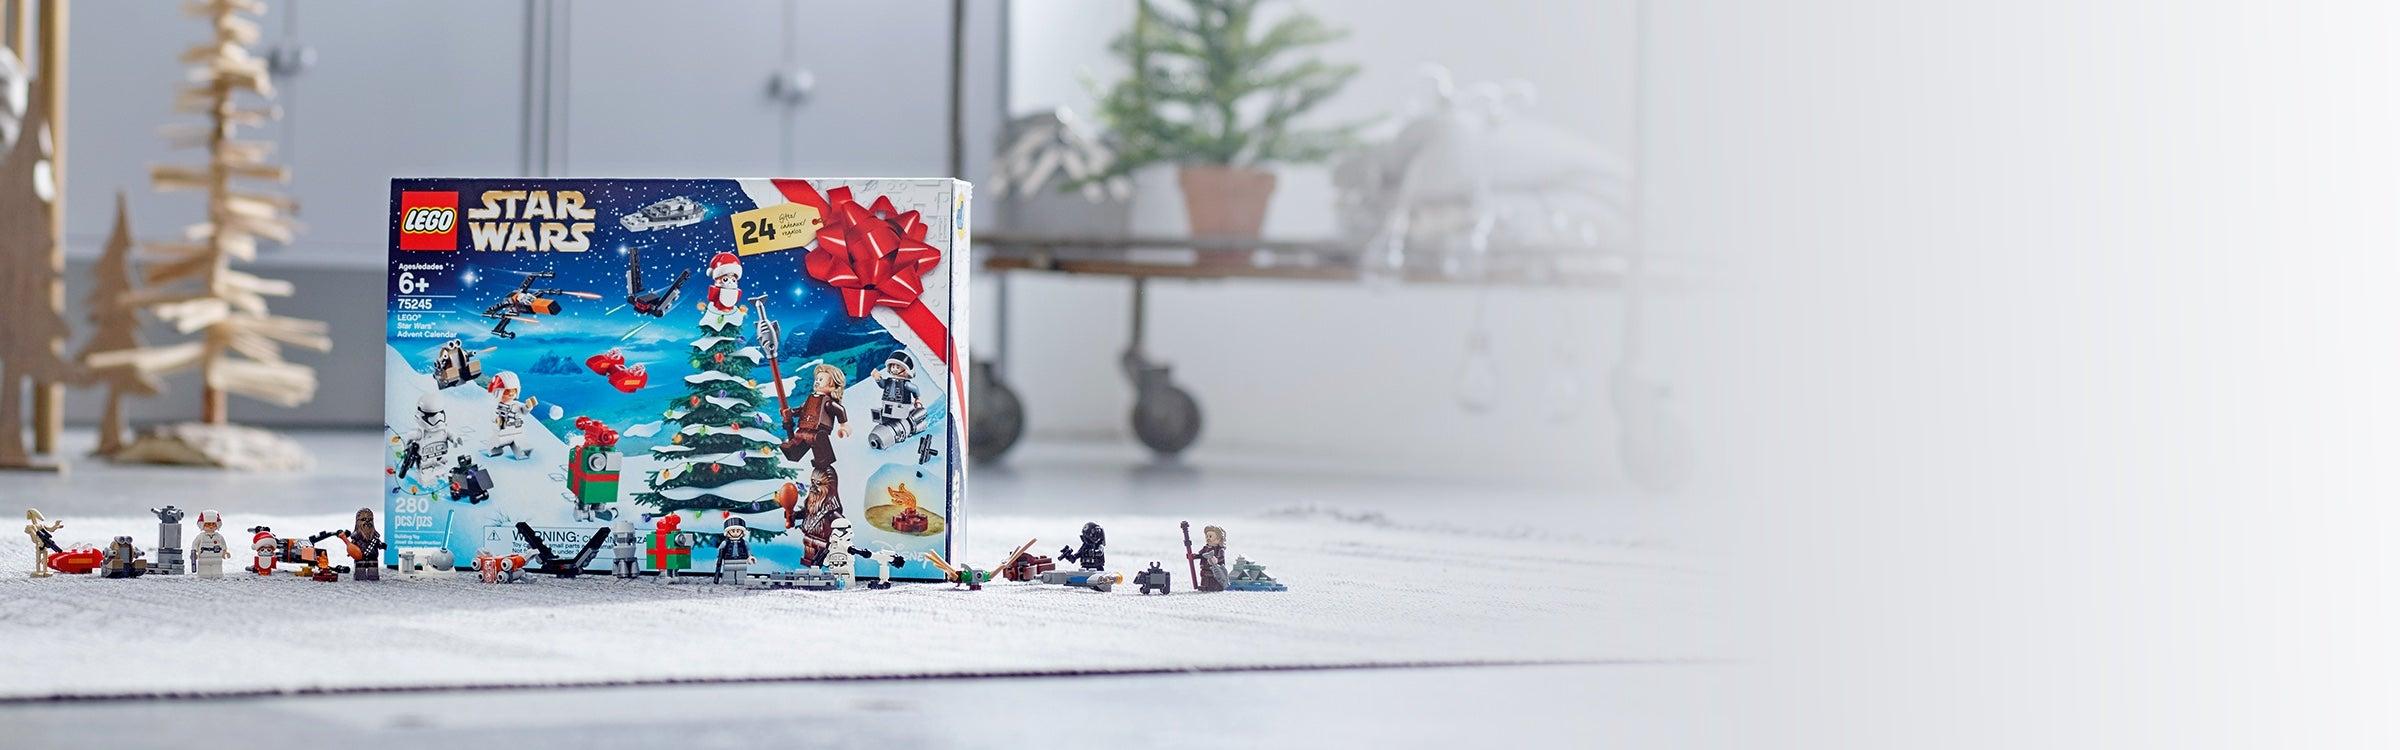 LEGO Star Wars Advent Calendar 75245 Disney 280 piece set Christmas